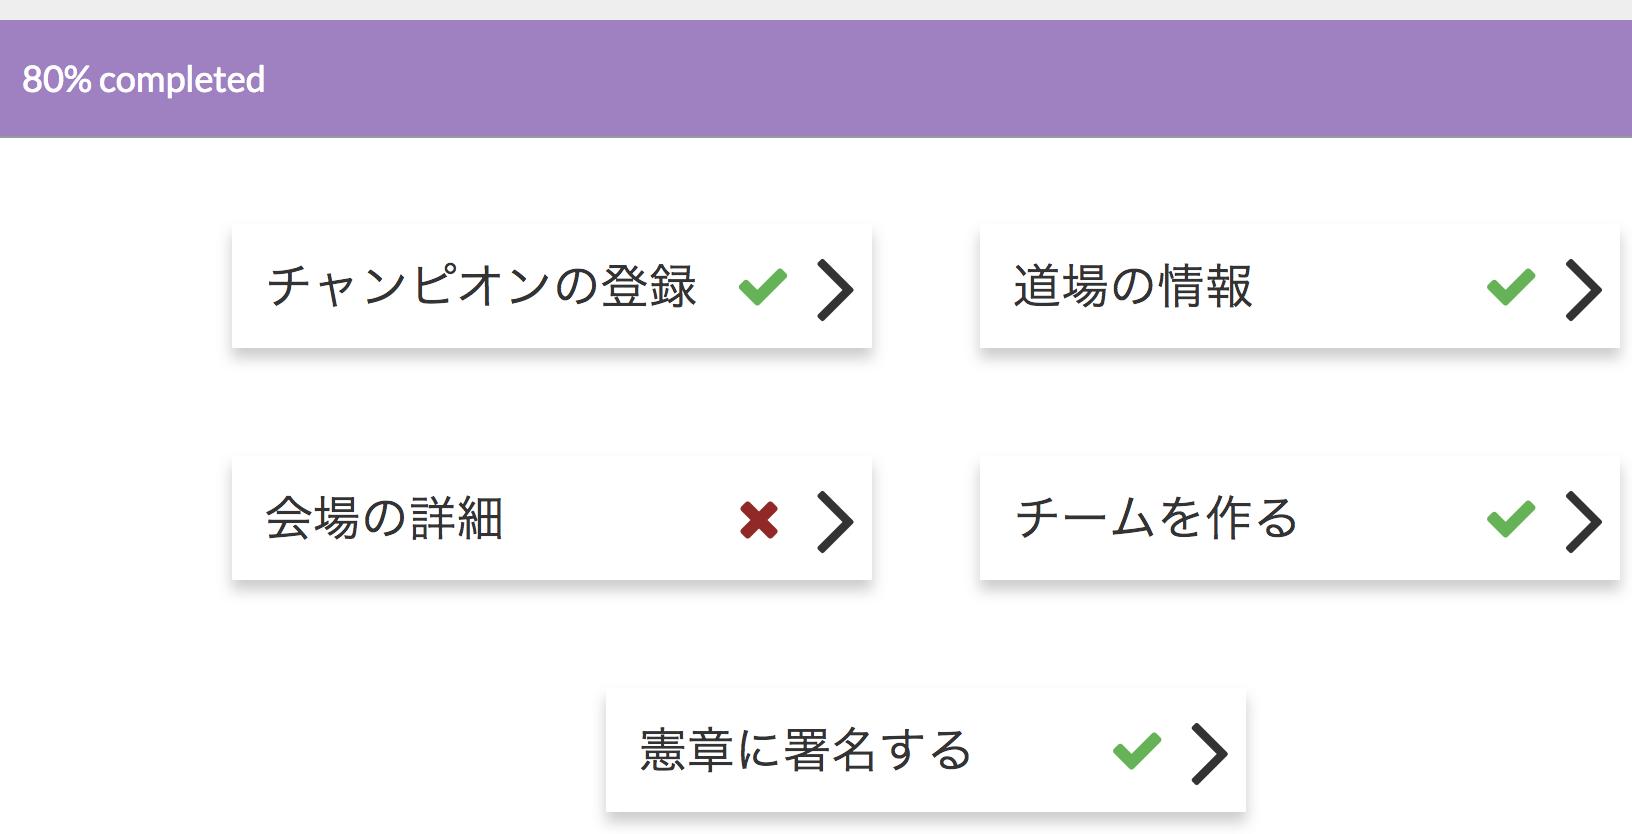 fireshot capture 10 - i coderdojo zen - https___zen coderdojo com_dashboard_start-dojo_review